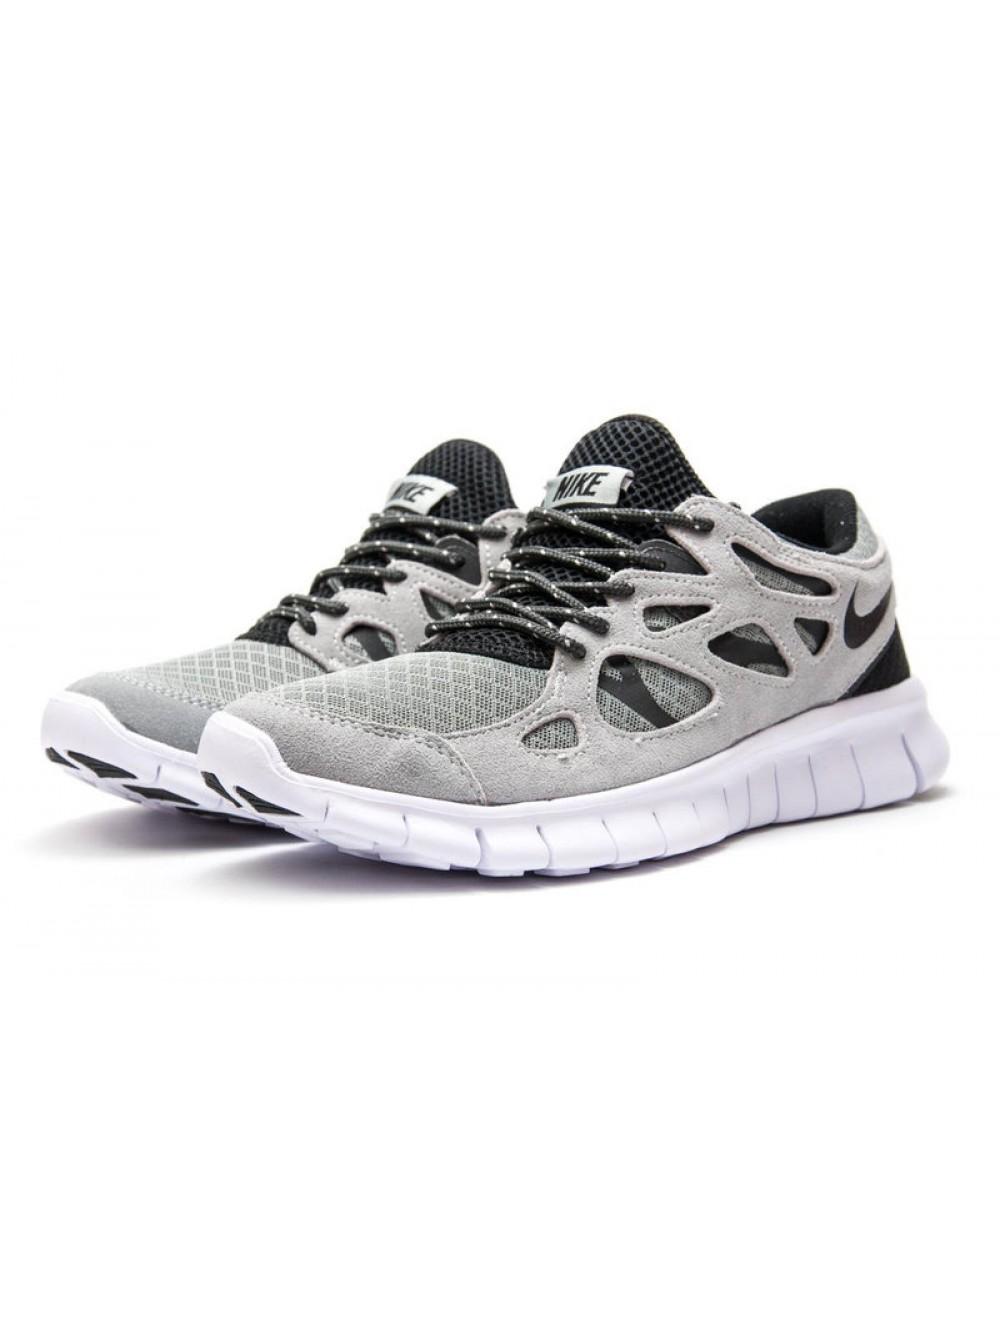 3448042e Кроссовки Nike Free Run, Светло-серый, 13445, 41-45р. Купить